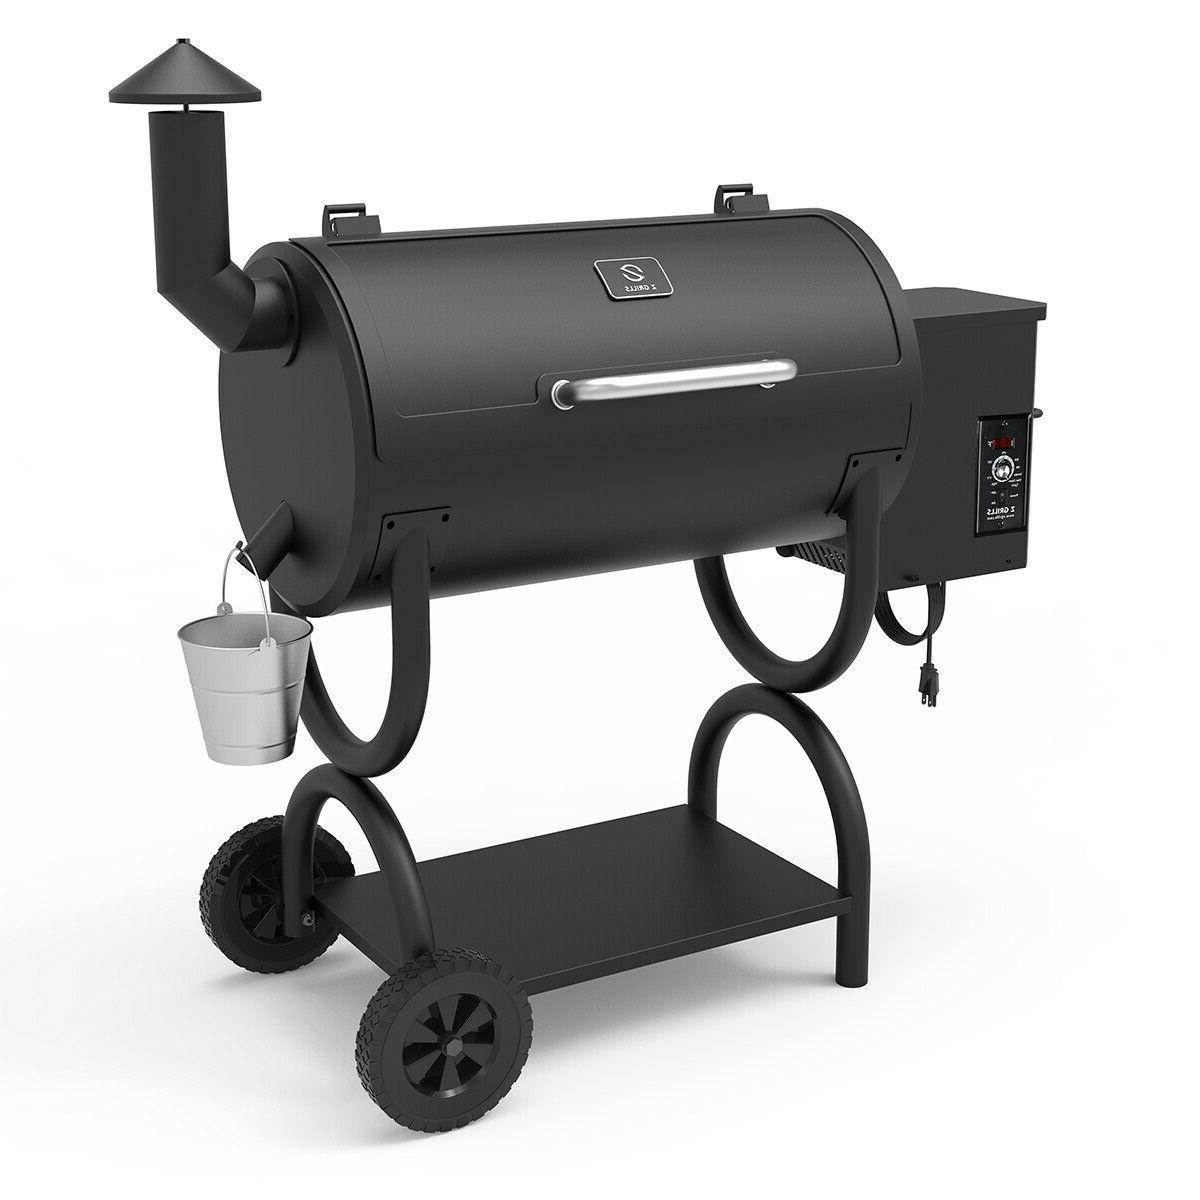 Z Grills ZPG-550B Wood Pellet Grill BBQ Smoker with Digital